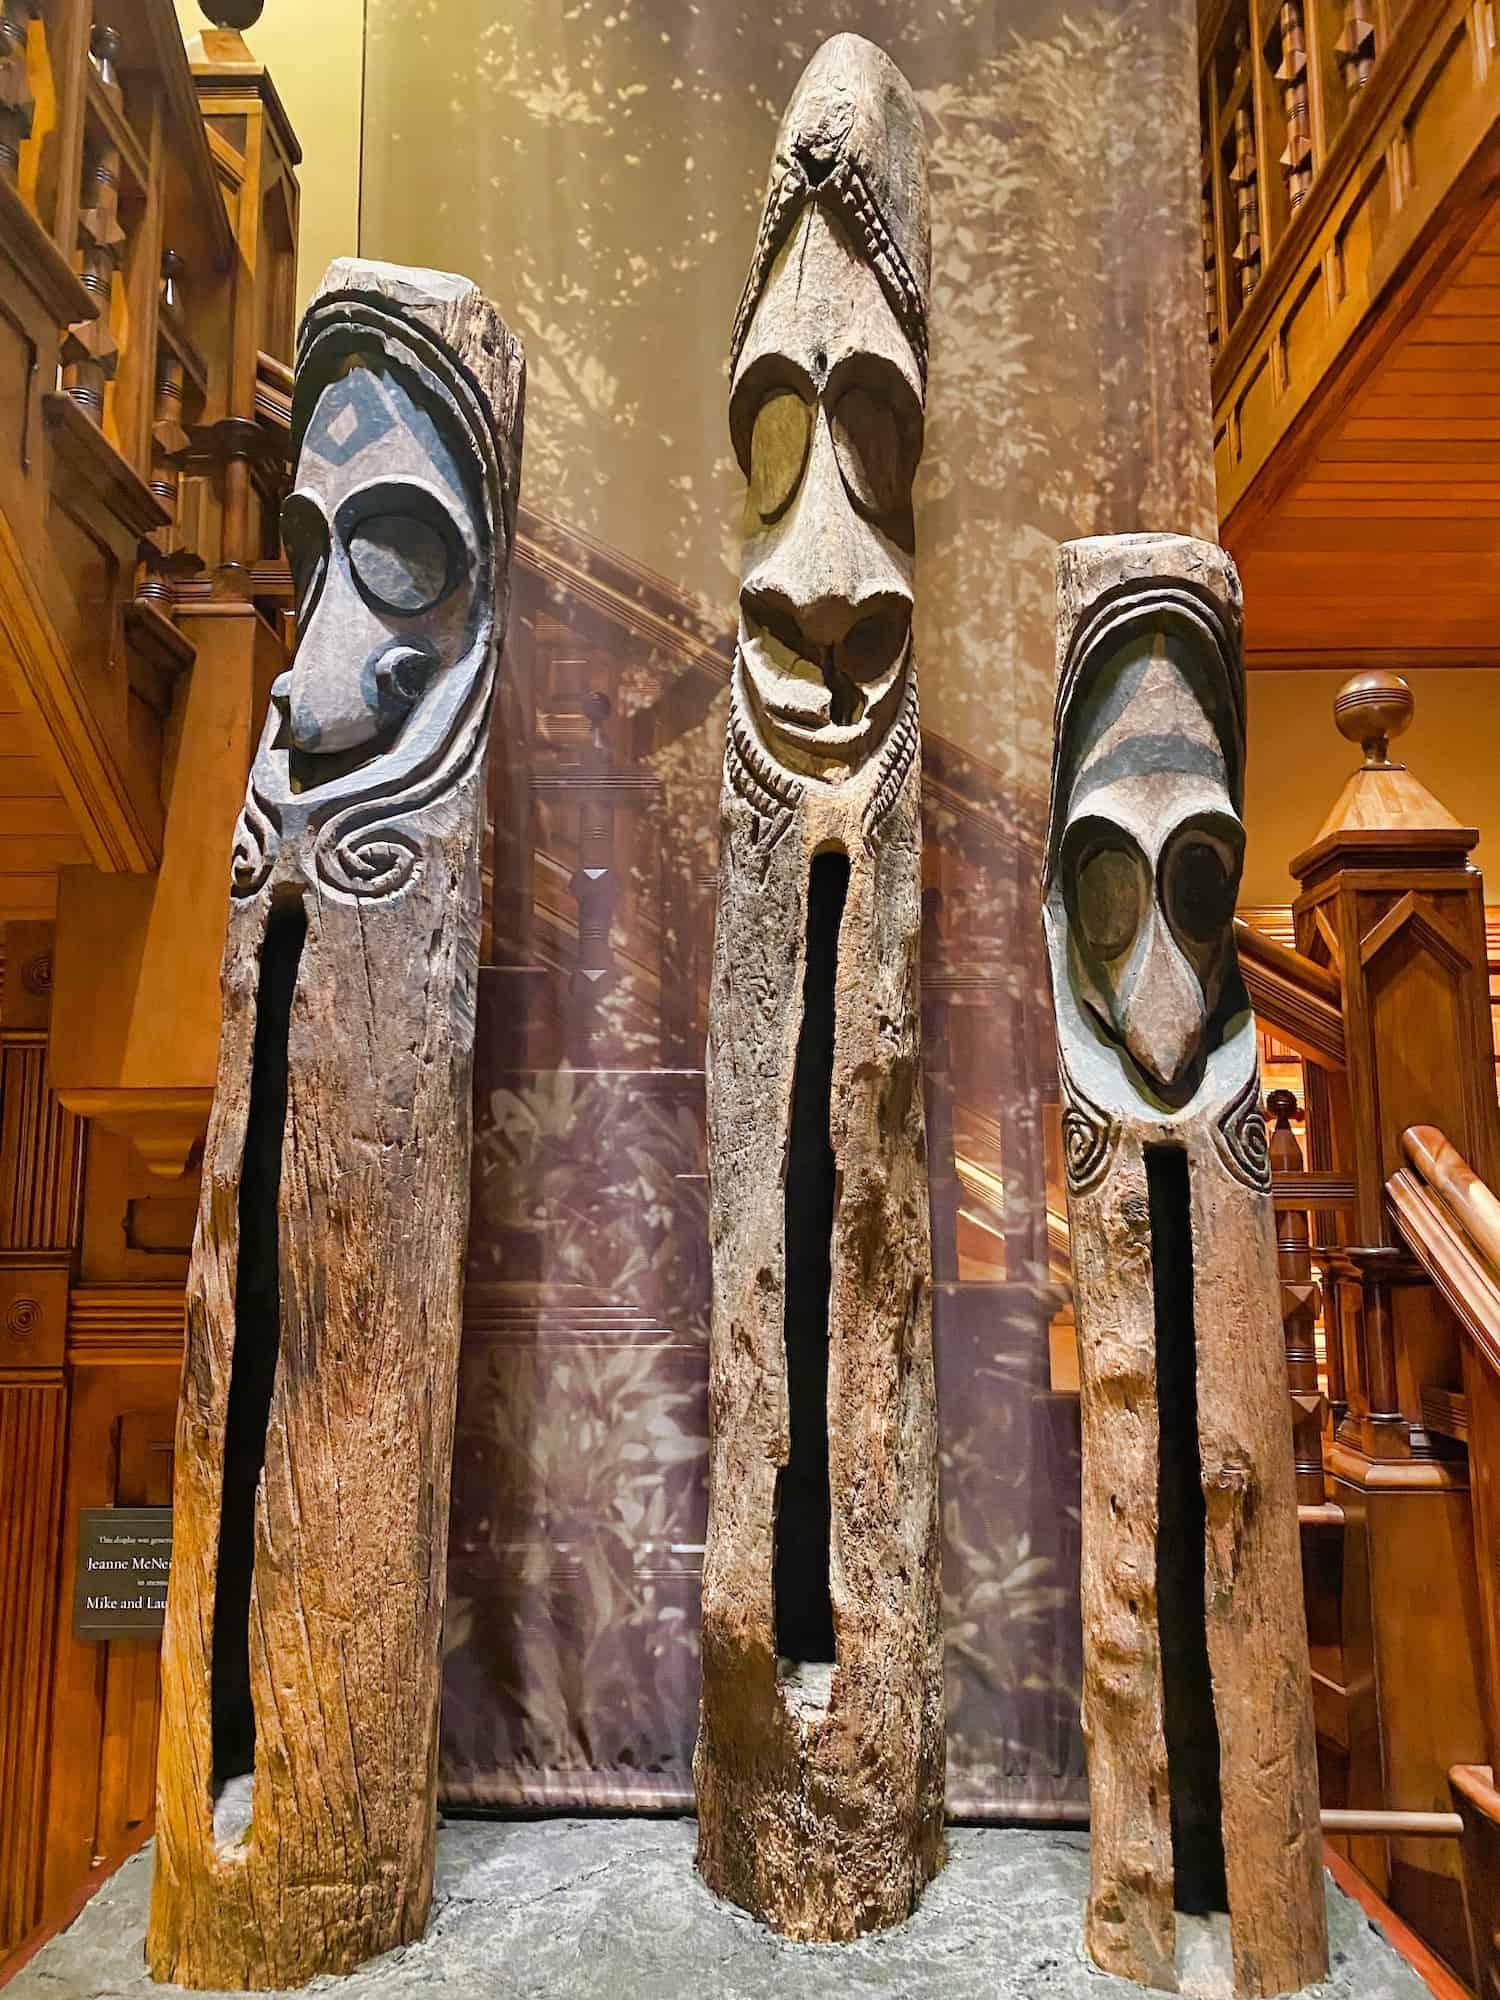 3 days on Oahu, Hawaii - Bishop Museum